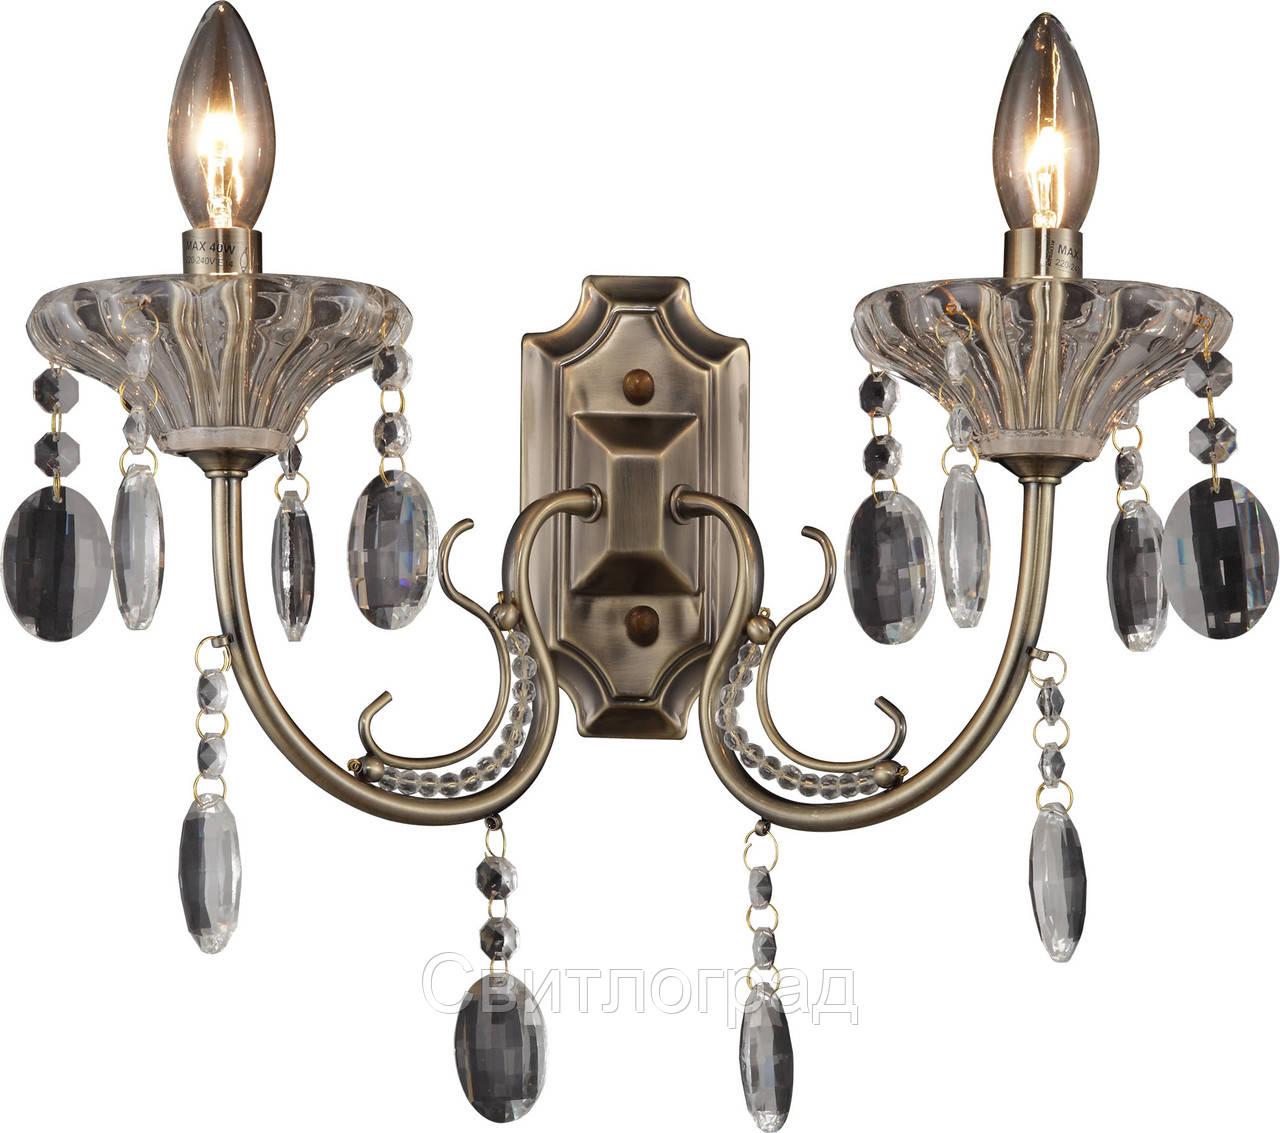 Бра Свеча  Классика  Altalusse INL-1102W-02 Antique Brass